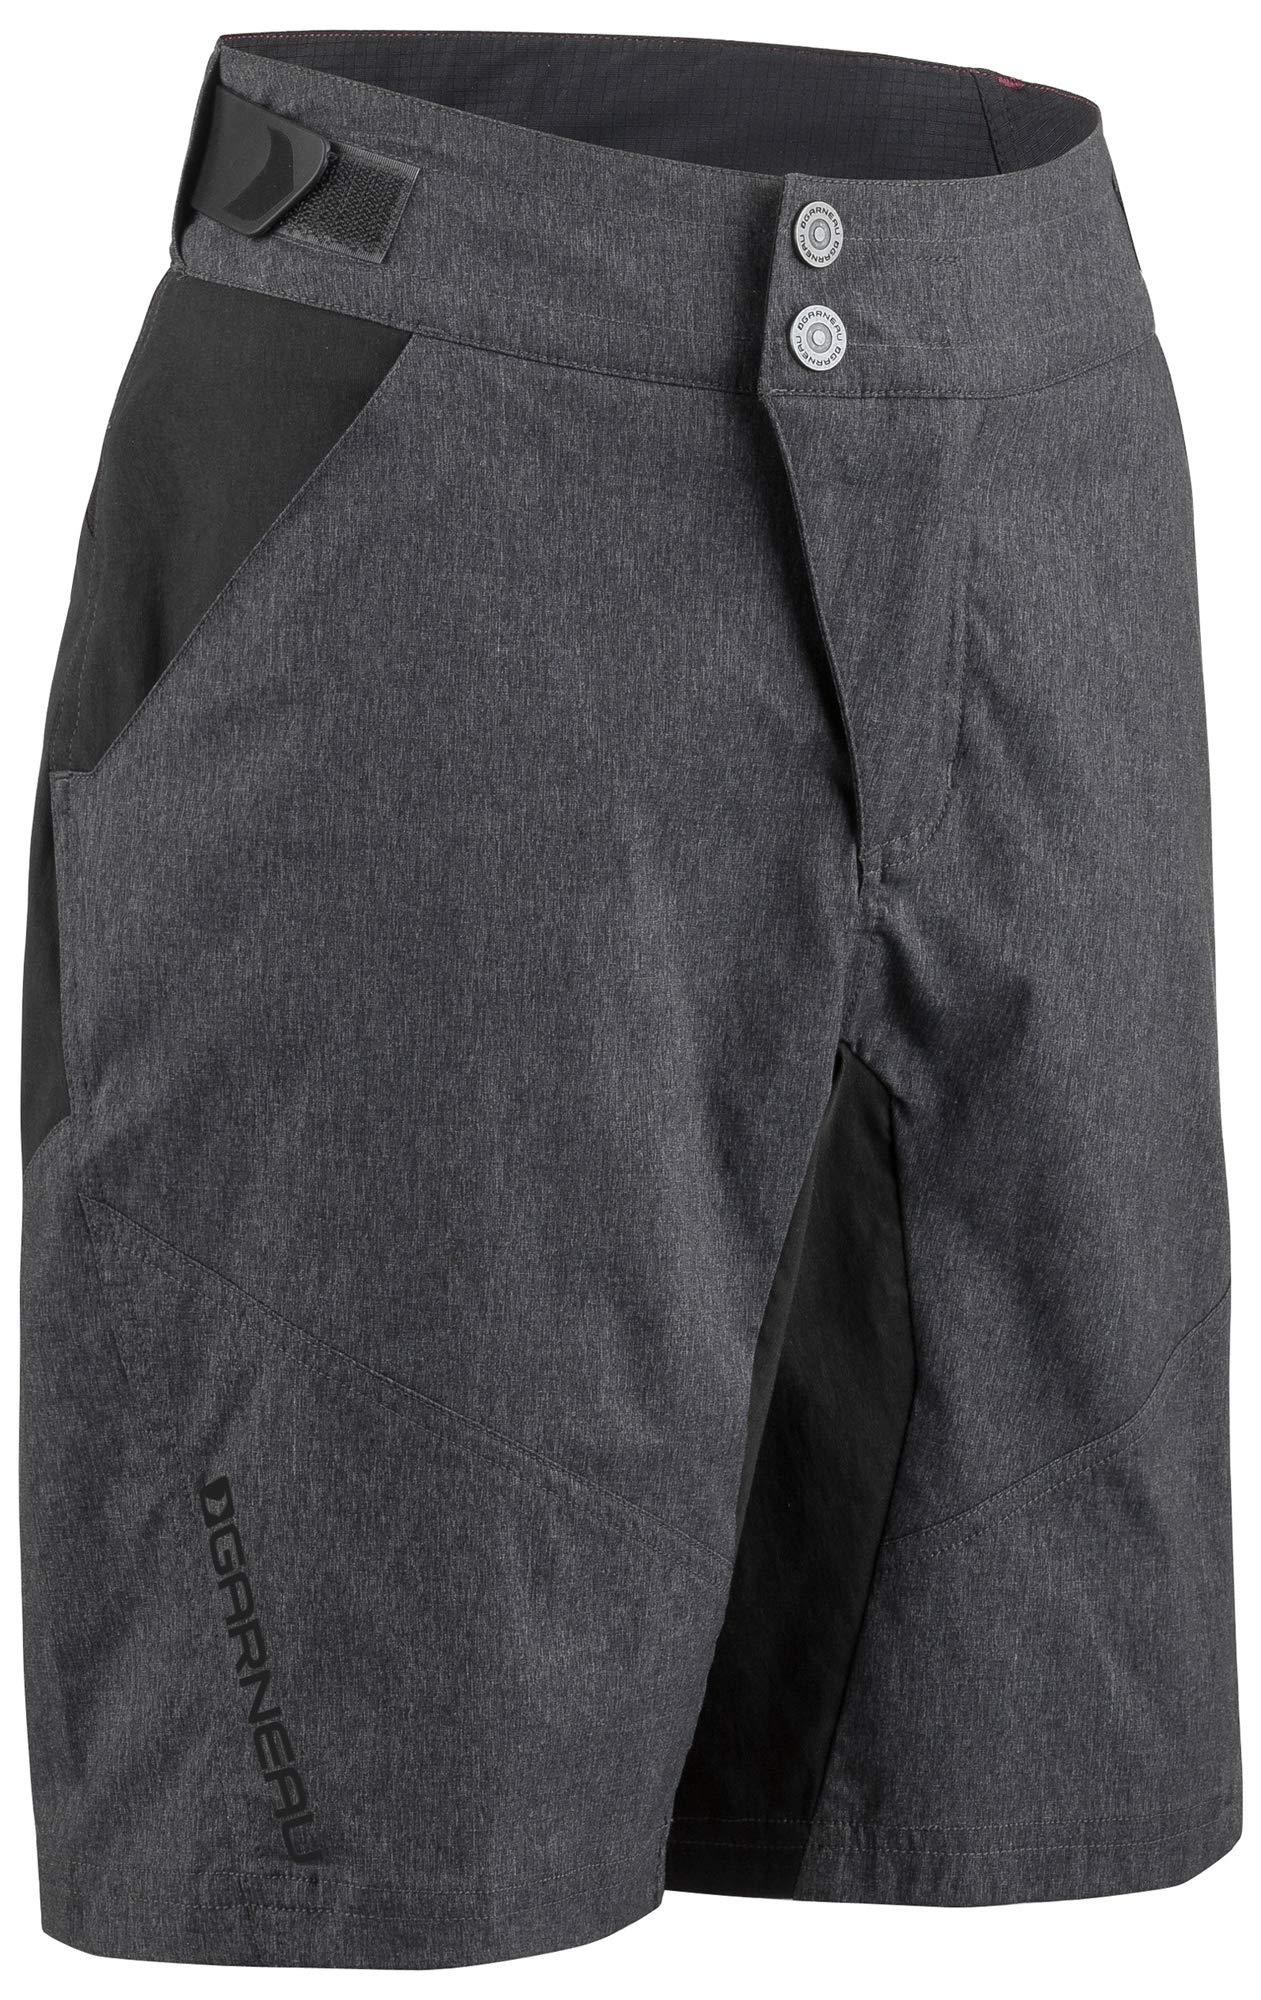 Louis Garneau Kids Dirt Bike Shorts, Black/Gray, Small by Louis Garneau